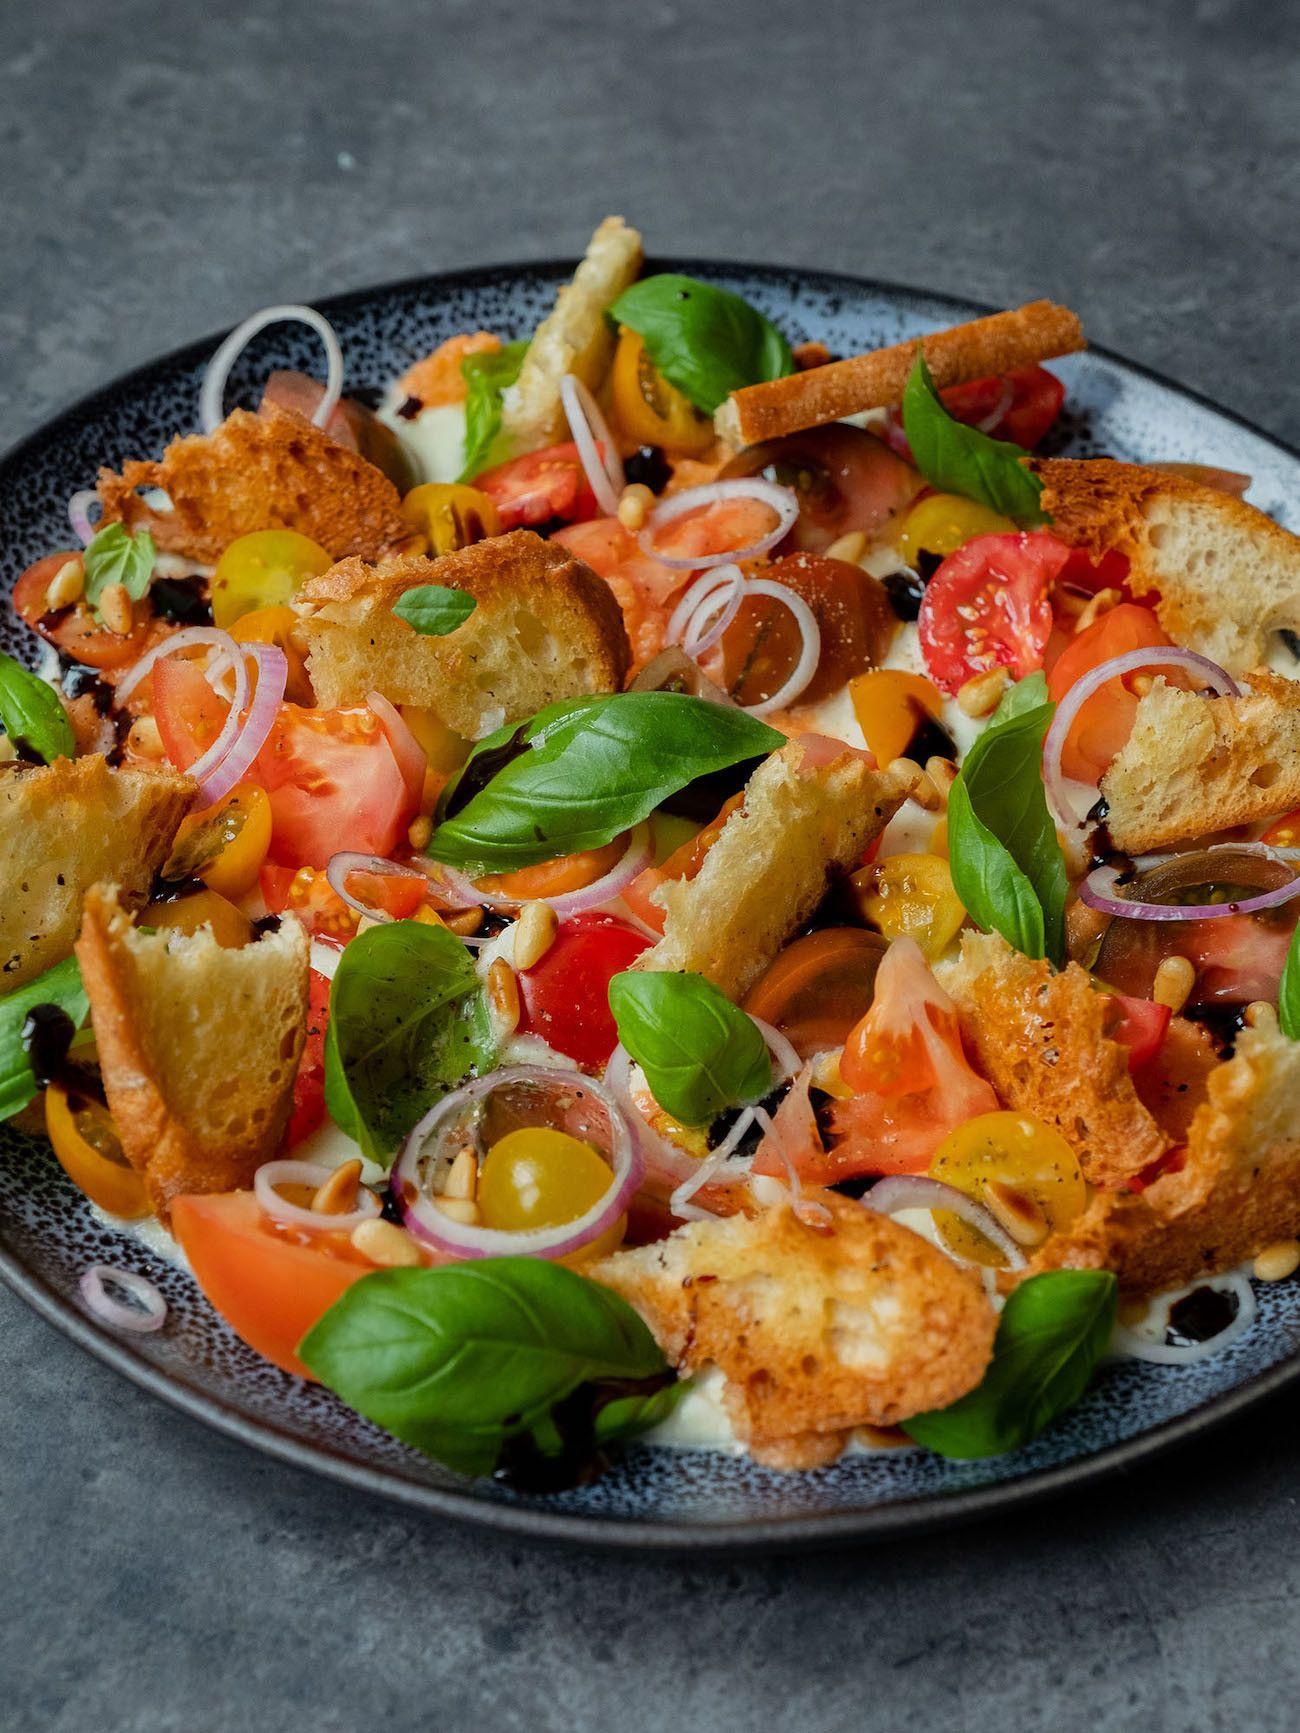 Foodblog, About Fuel, Rezept, Caprese Salat, Basilikum, Balsamico, Mozzarella